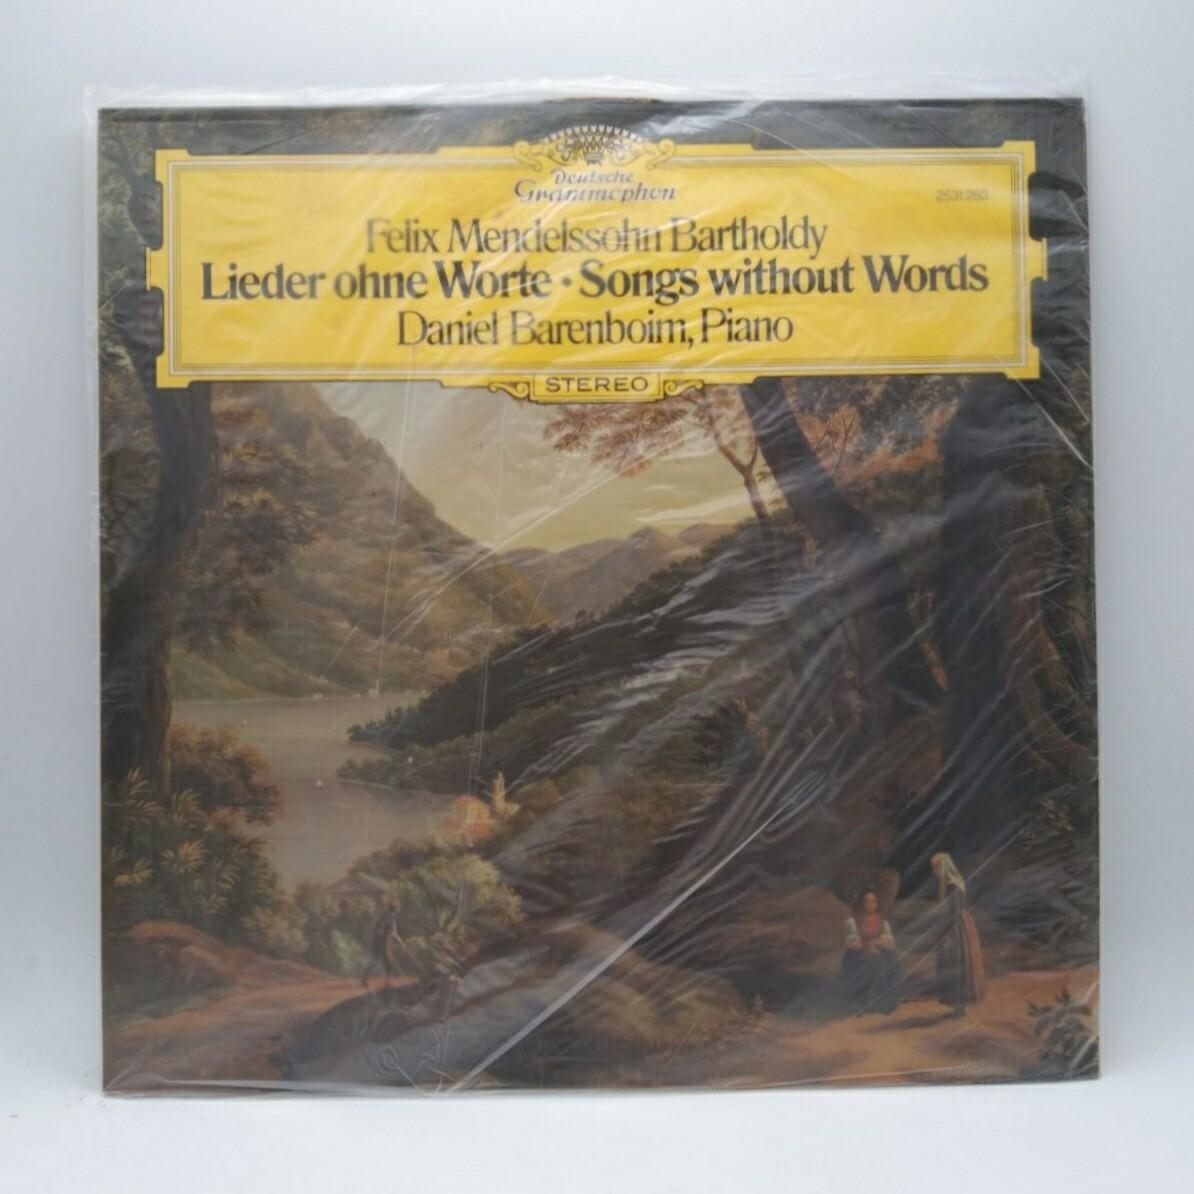 [USED] FELIX MENDELSSOHN BARTHOLDY•DANIEL BARENBOIM  -LIEDER OHNE WORTE=SONGS WITHOUT WORDS- LP